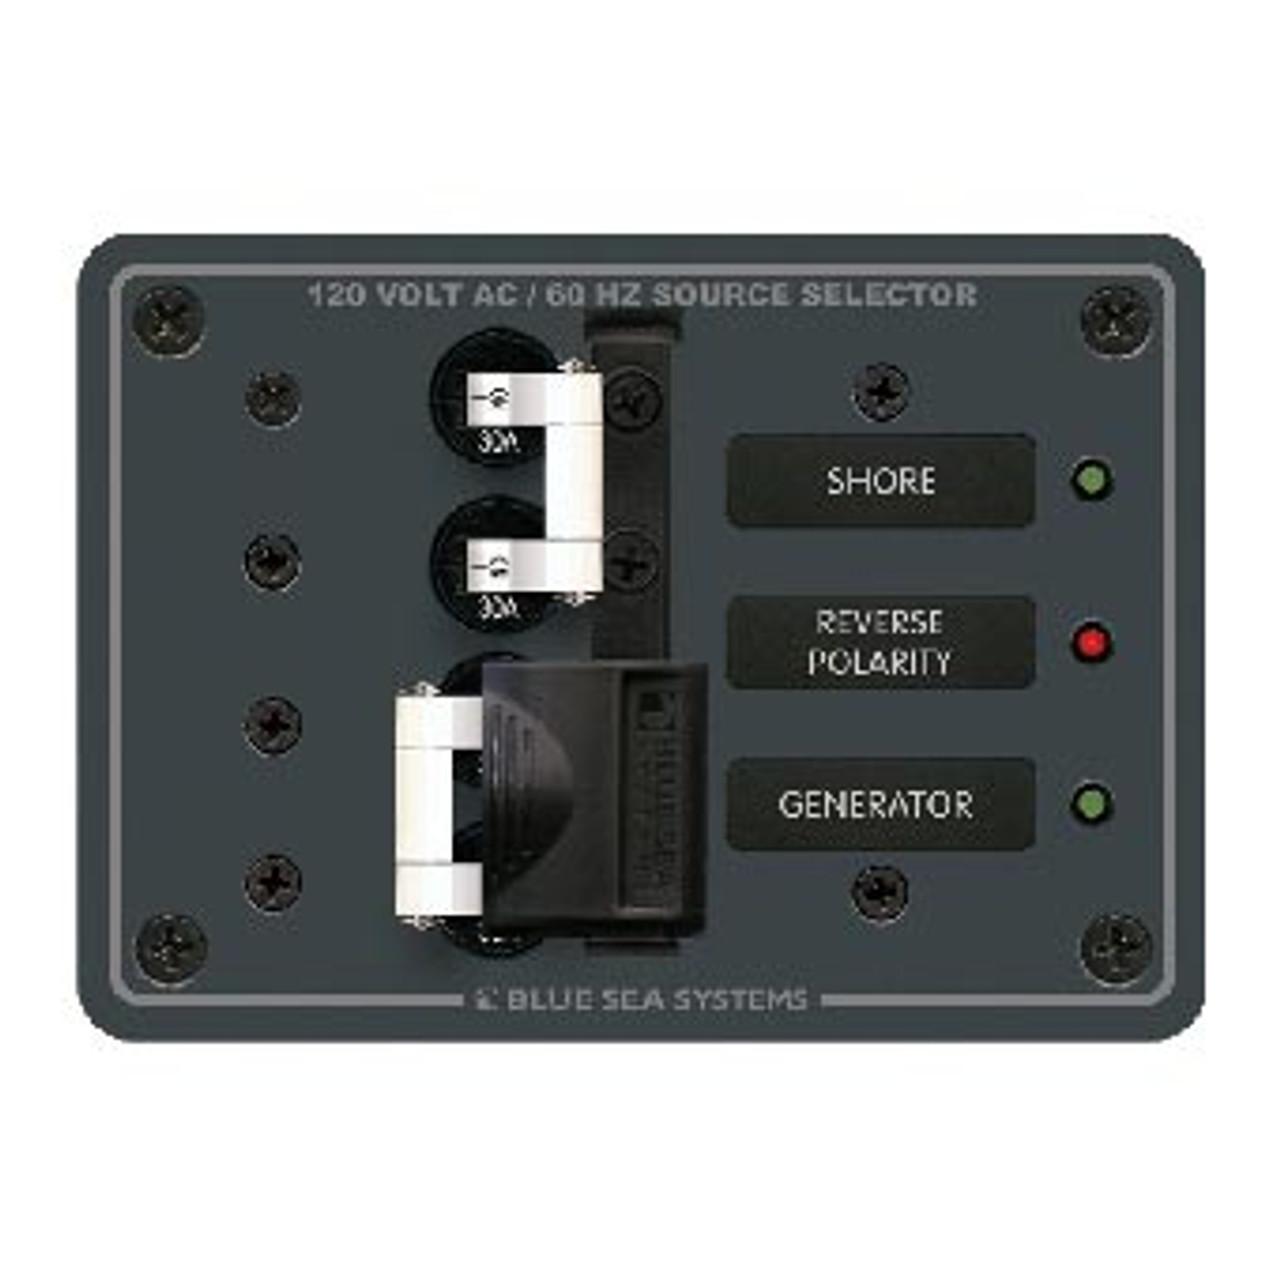 PANEL AC 2 SOURCE 2-MAIN 30 AMP 120V